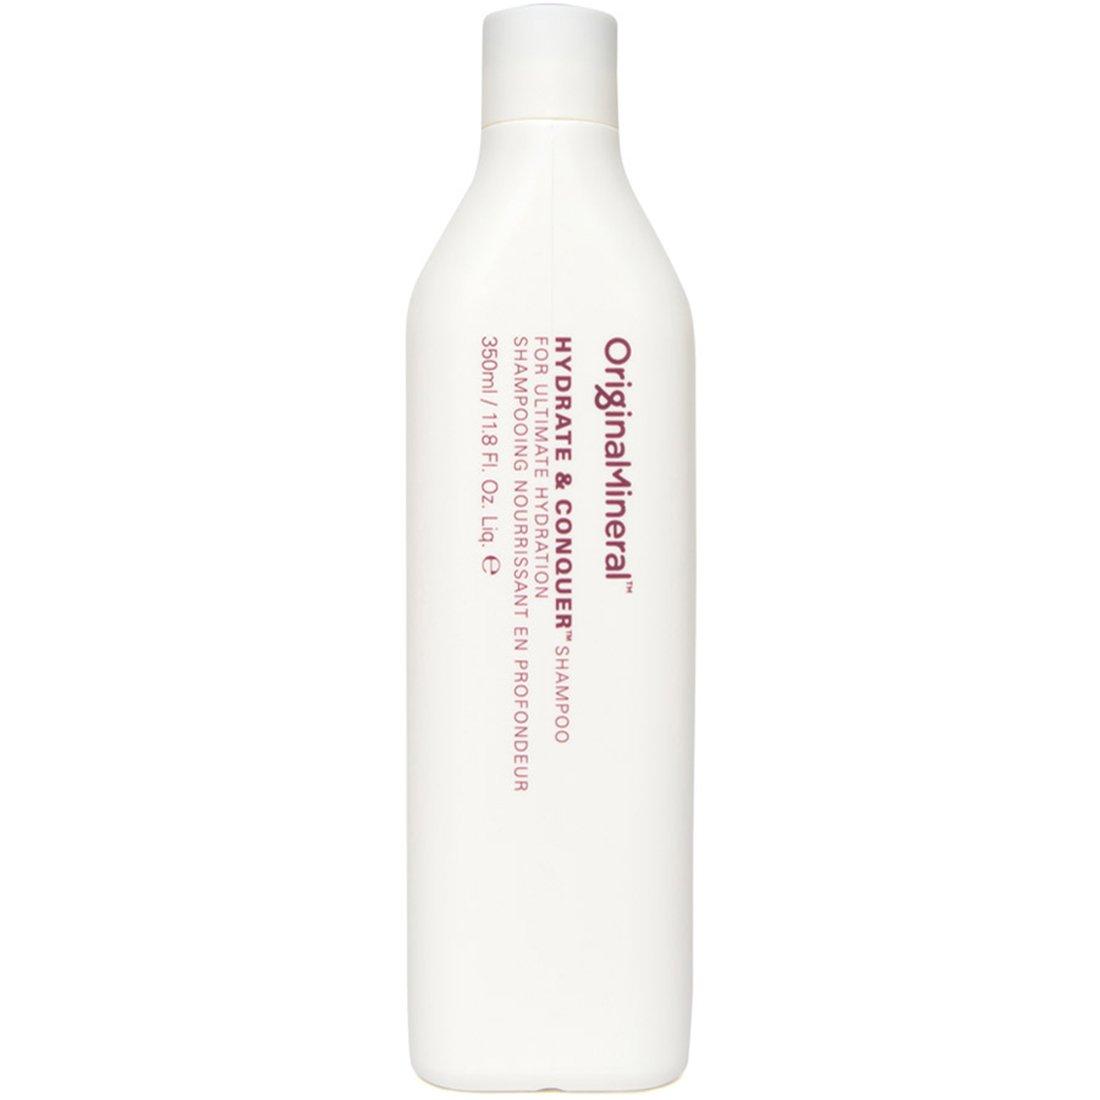 original Mineral hydrate and concuer Shampoo kabuki hair